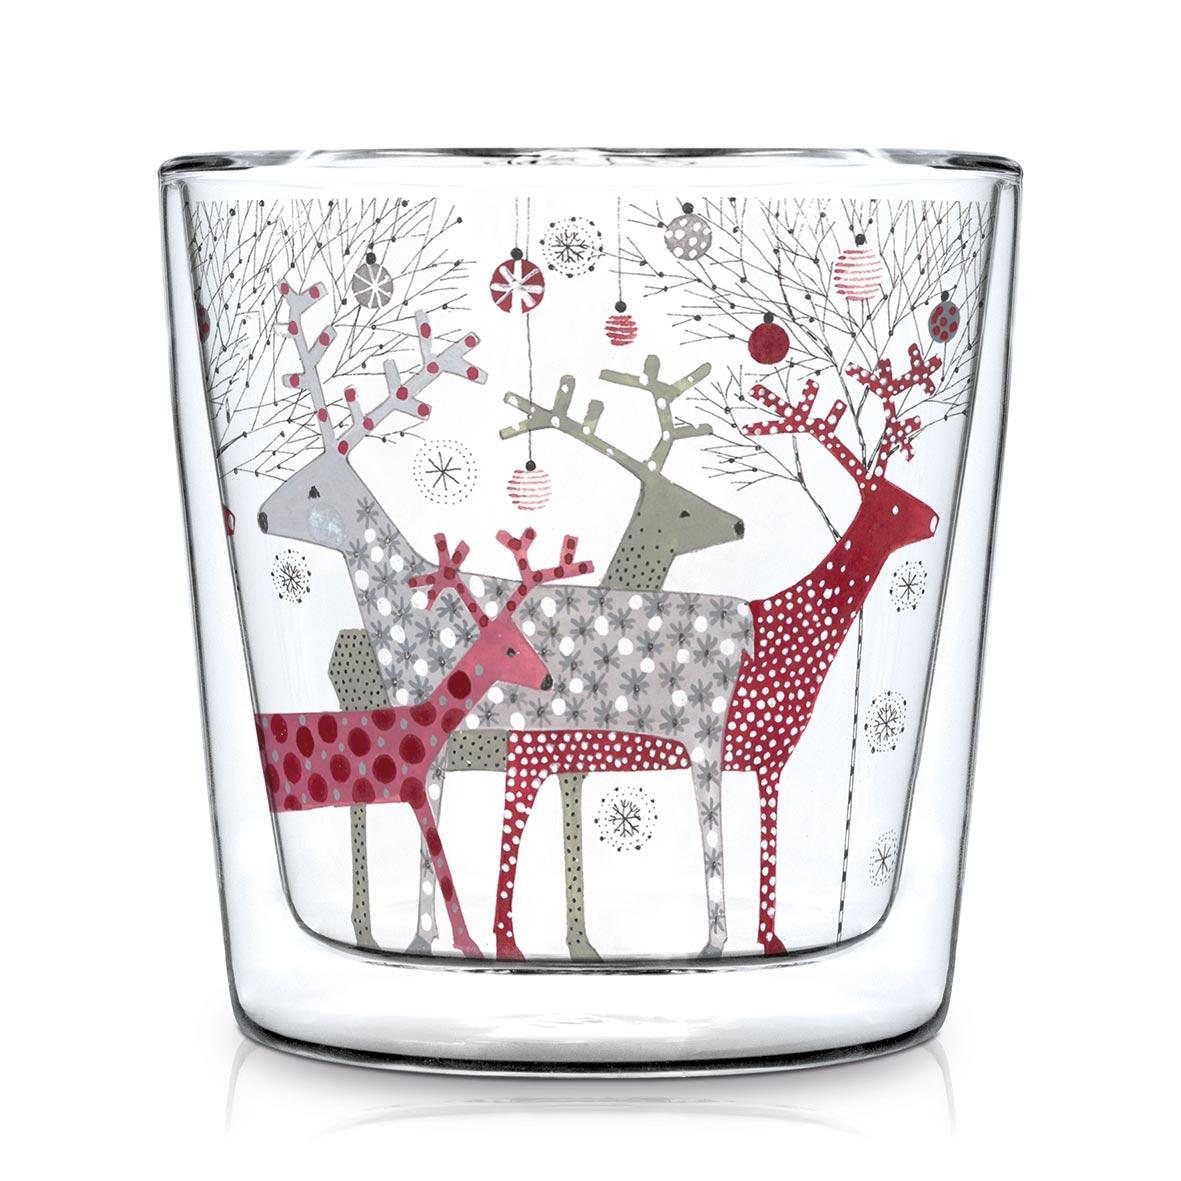 Vidrio de doble pared - Scandic Christmas Trendglas DW